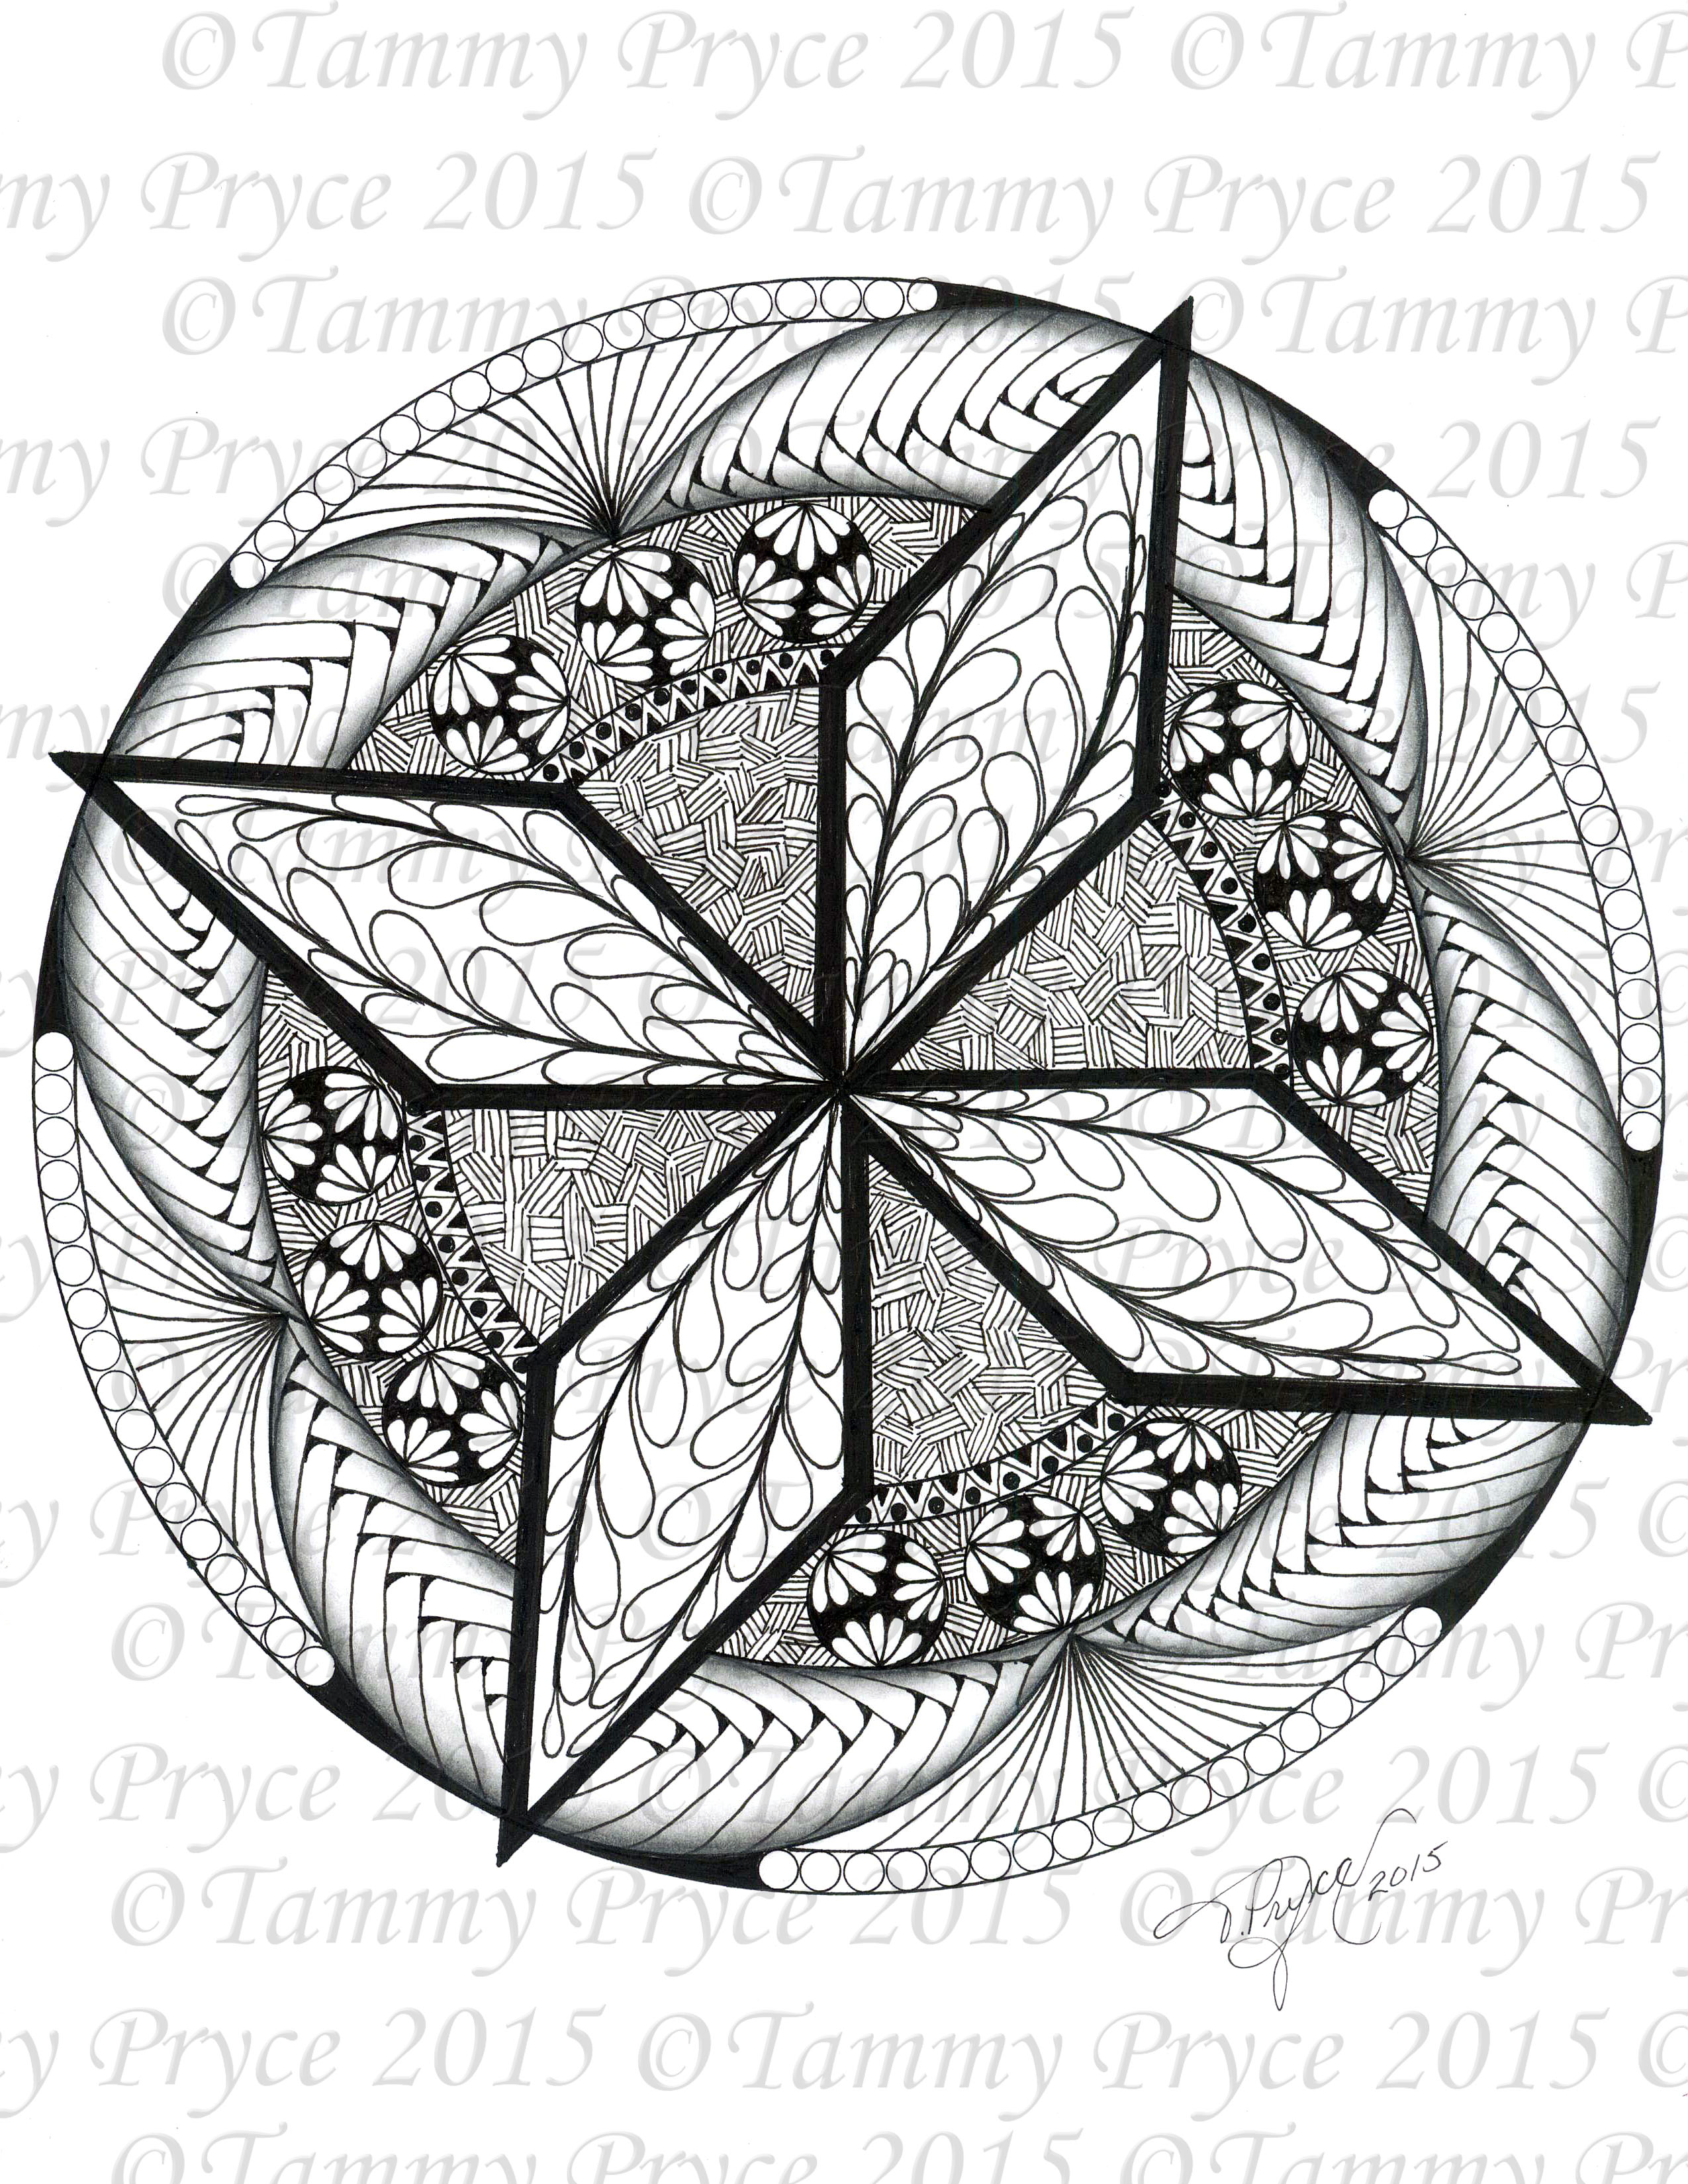 Drawn star printable Mandala Instant Drawn Star Coloring